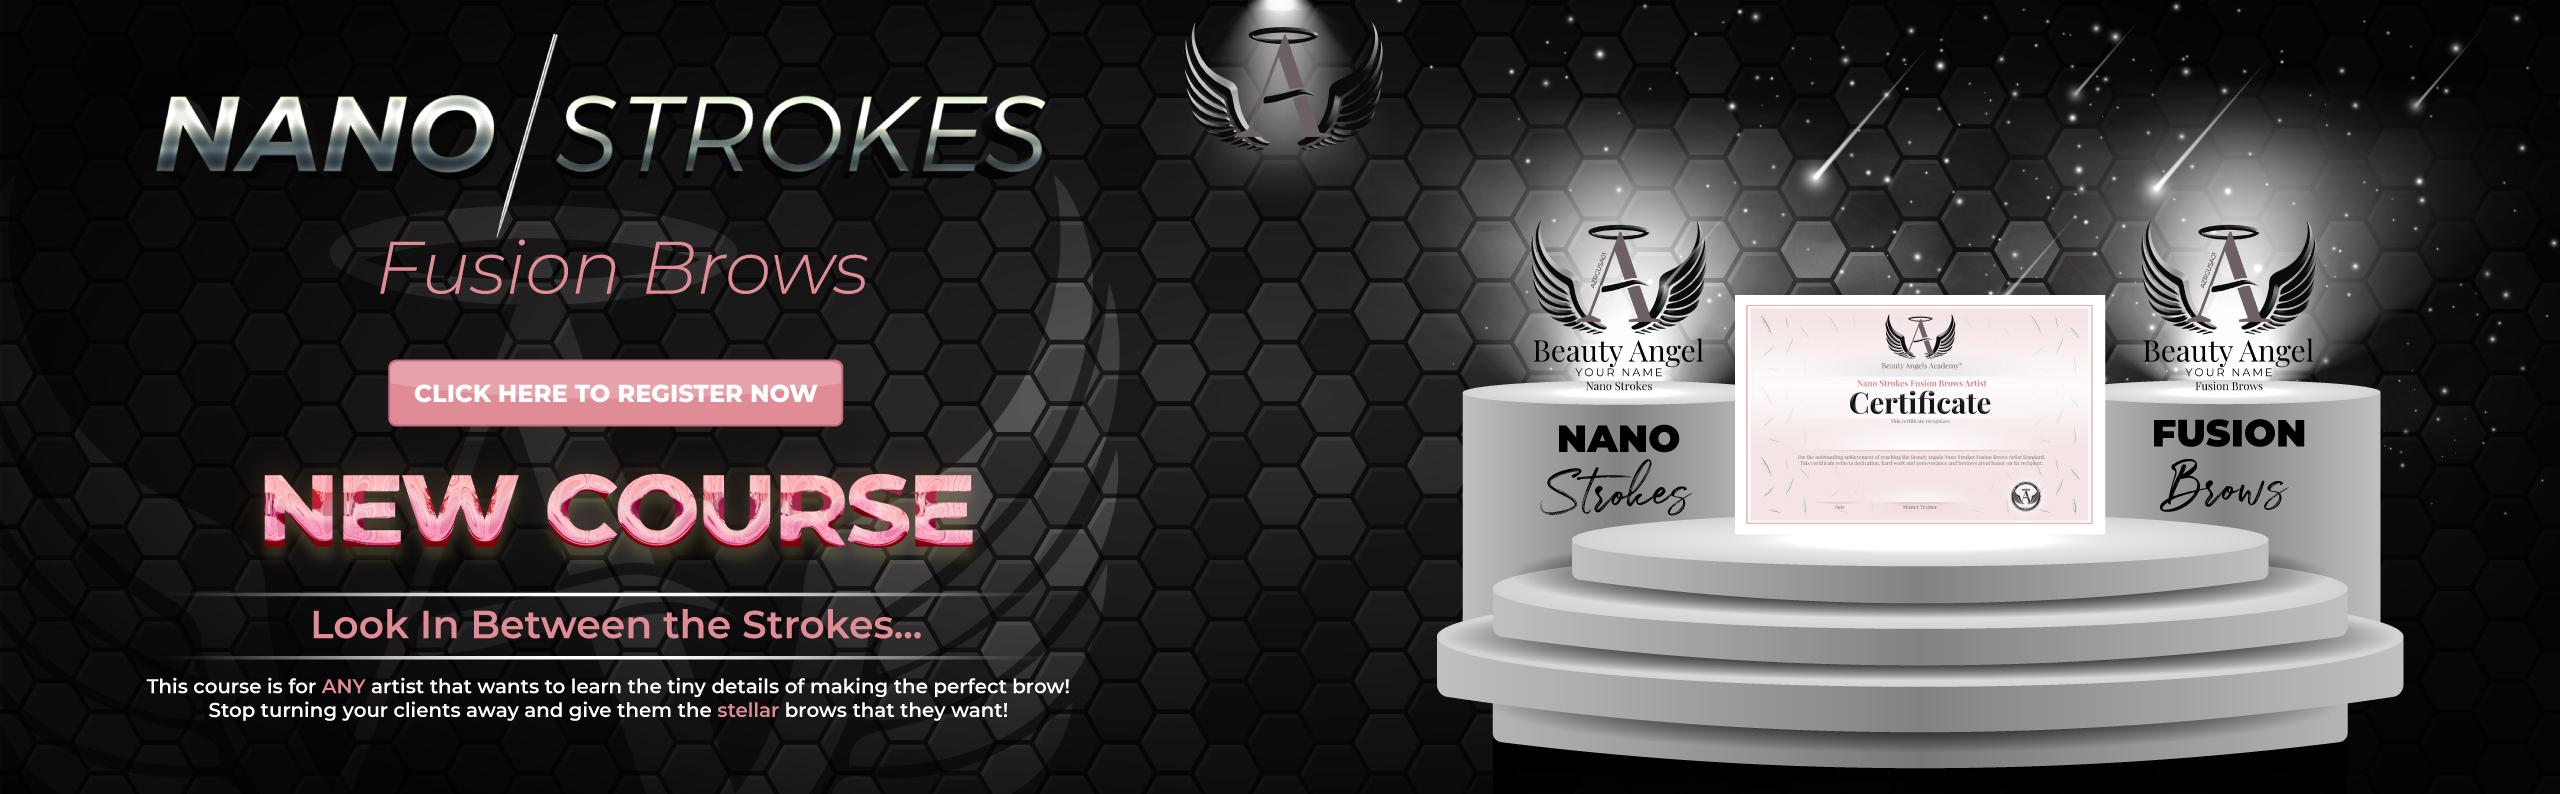 nano-strokes